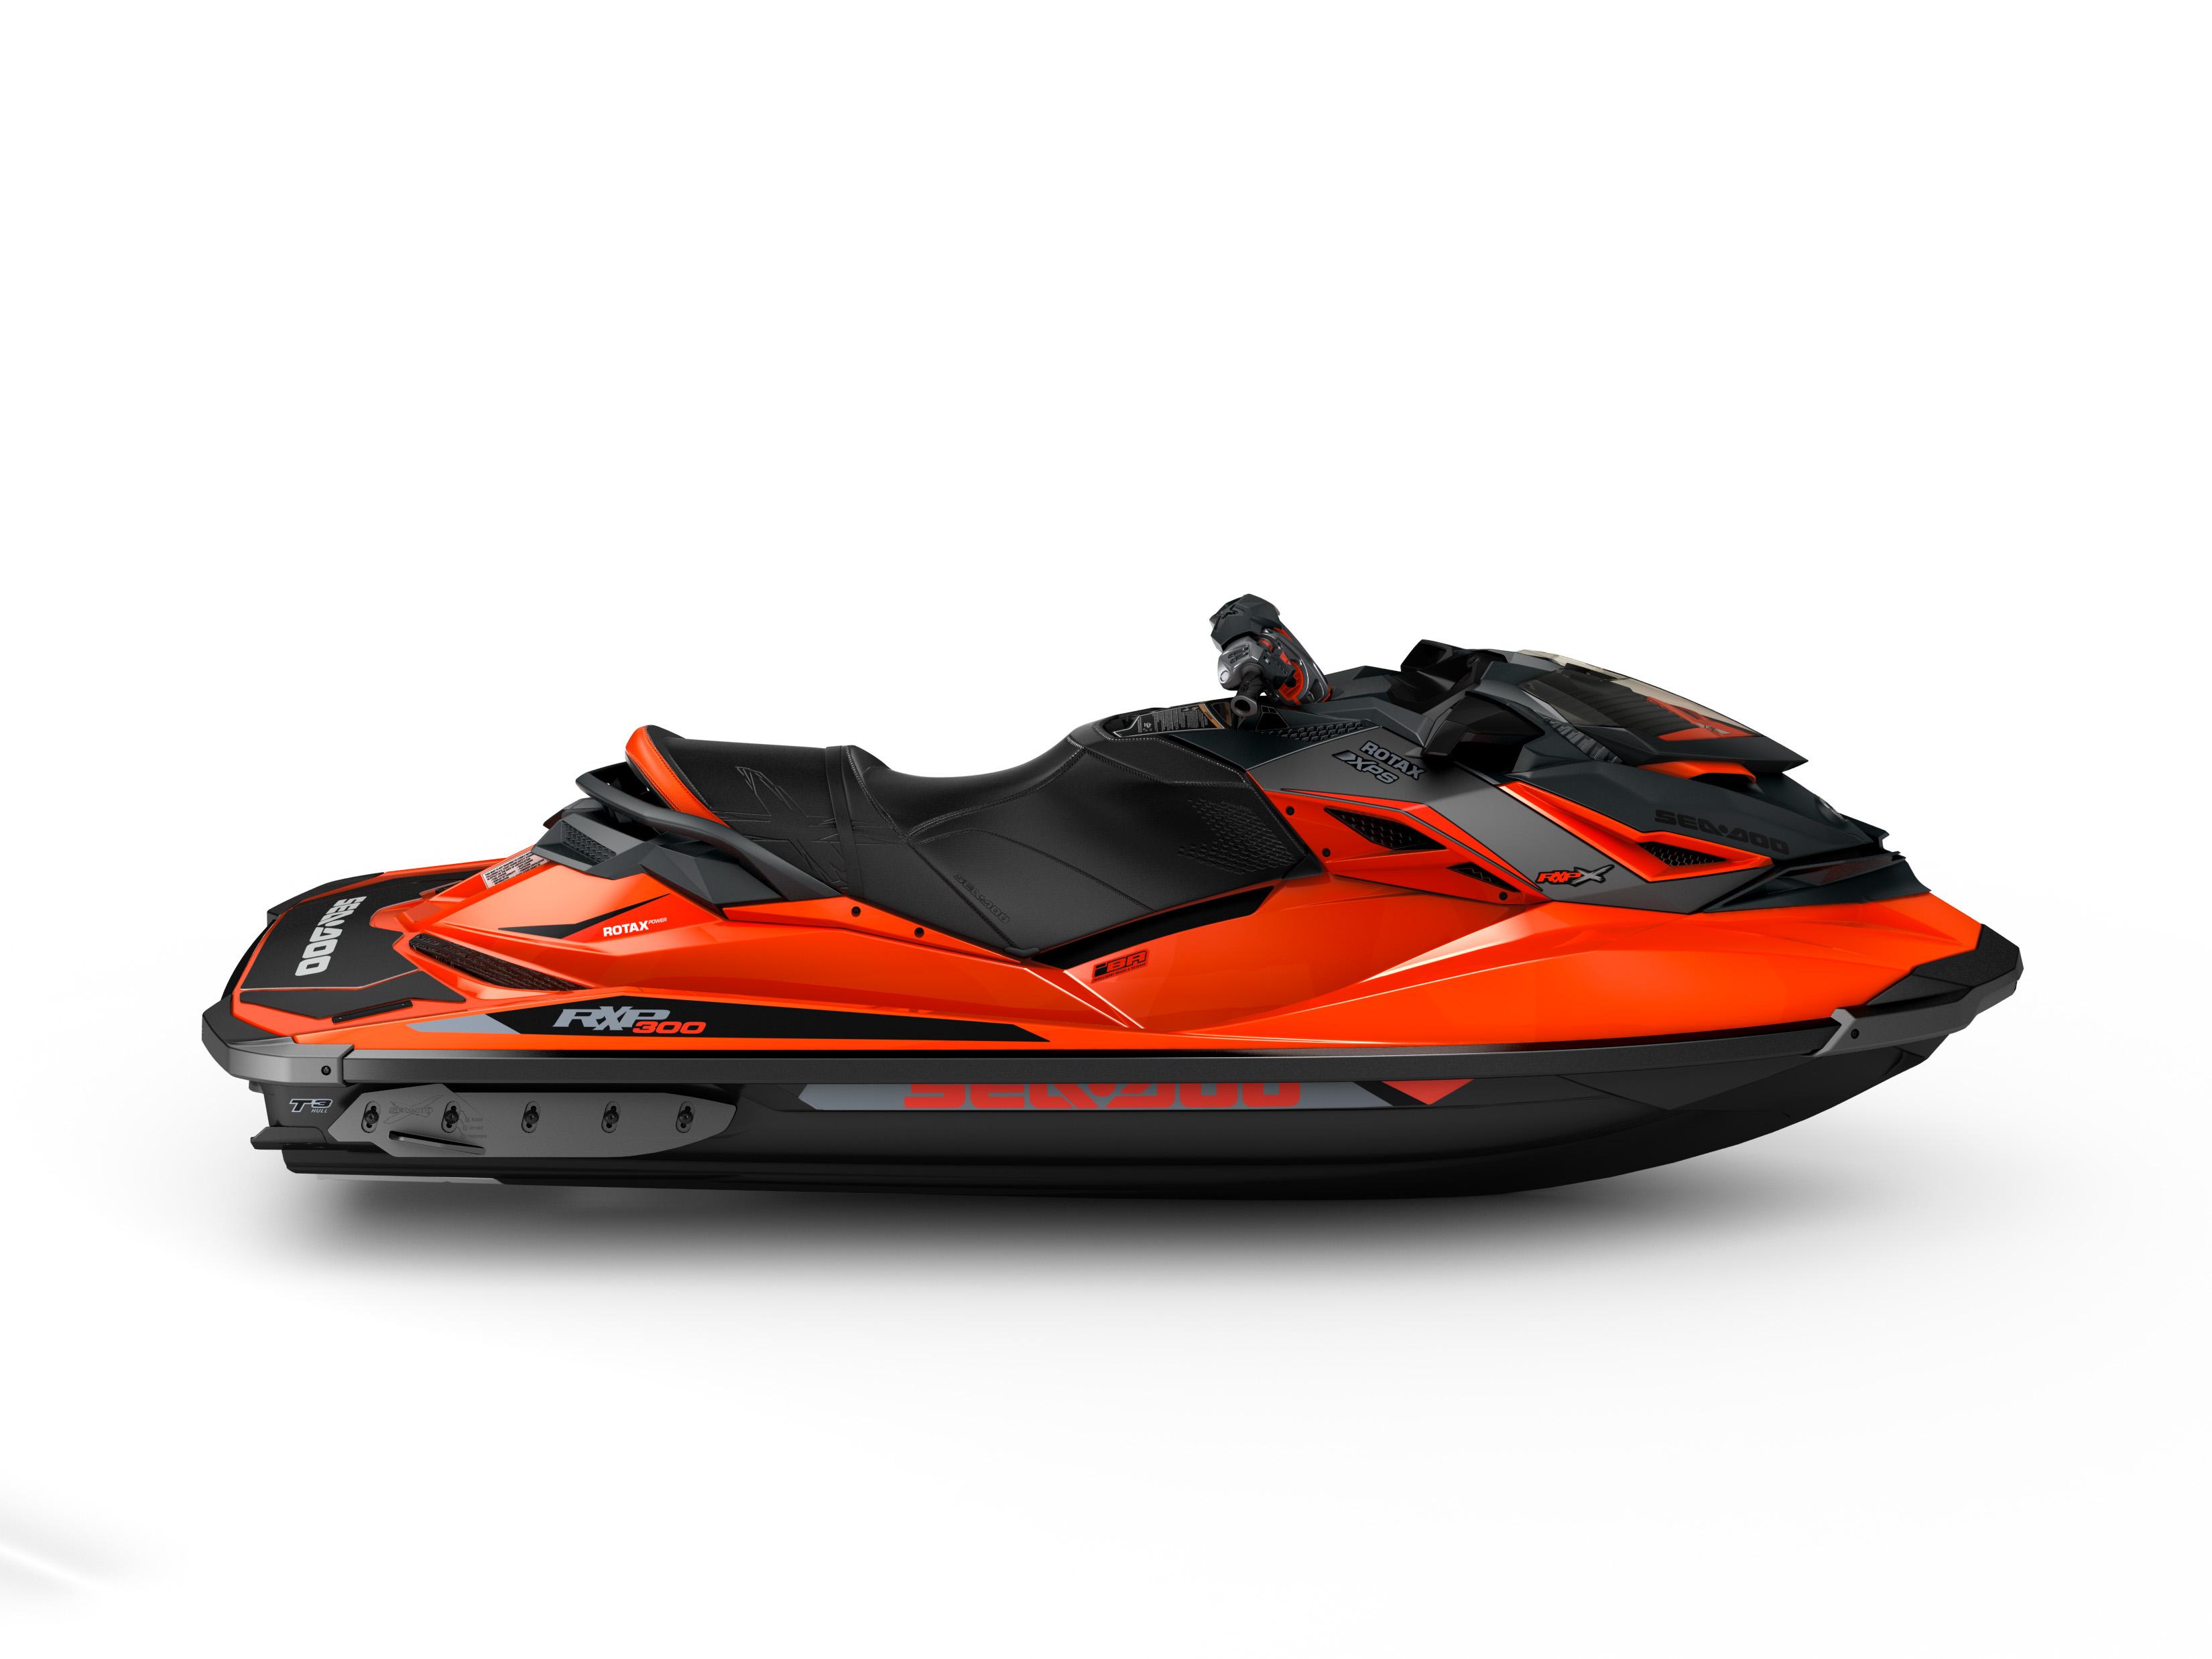 Seadoo Prices >> Seadoo RXP-X 300 | Deegan Marine